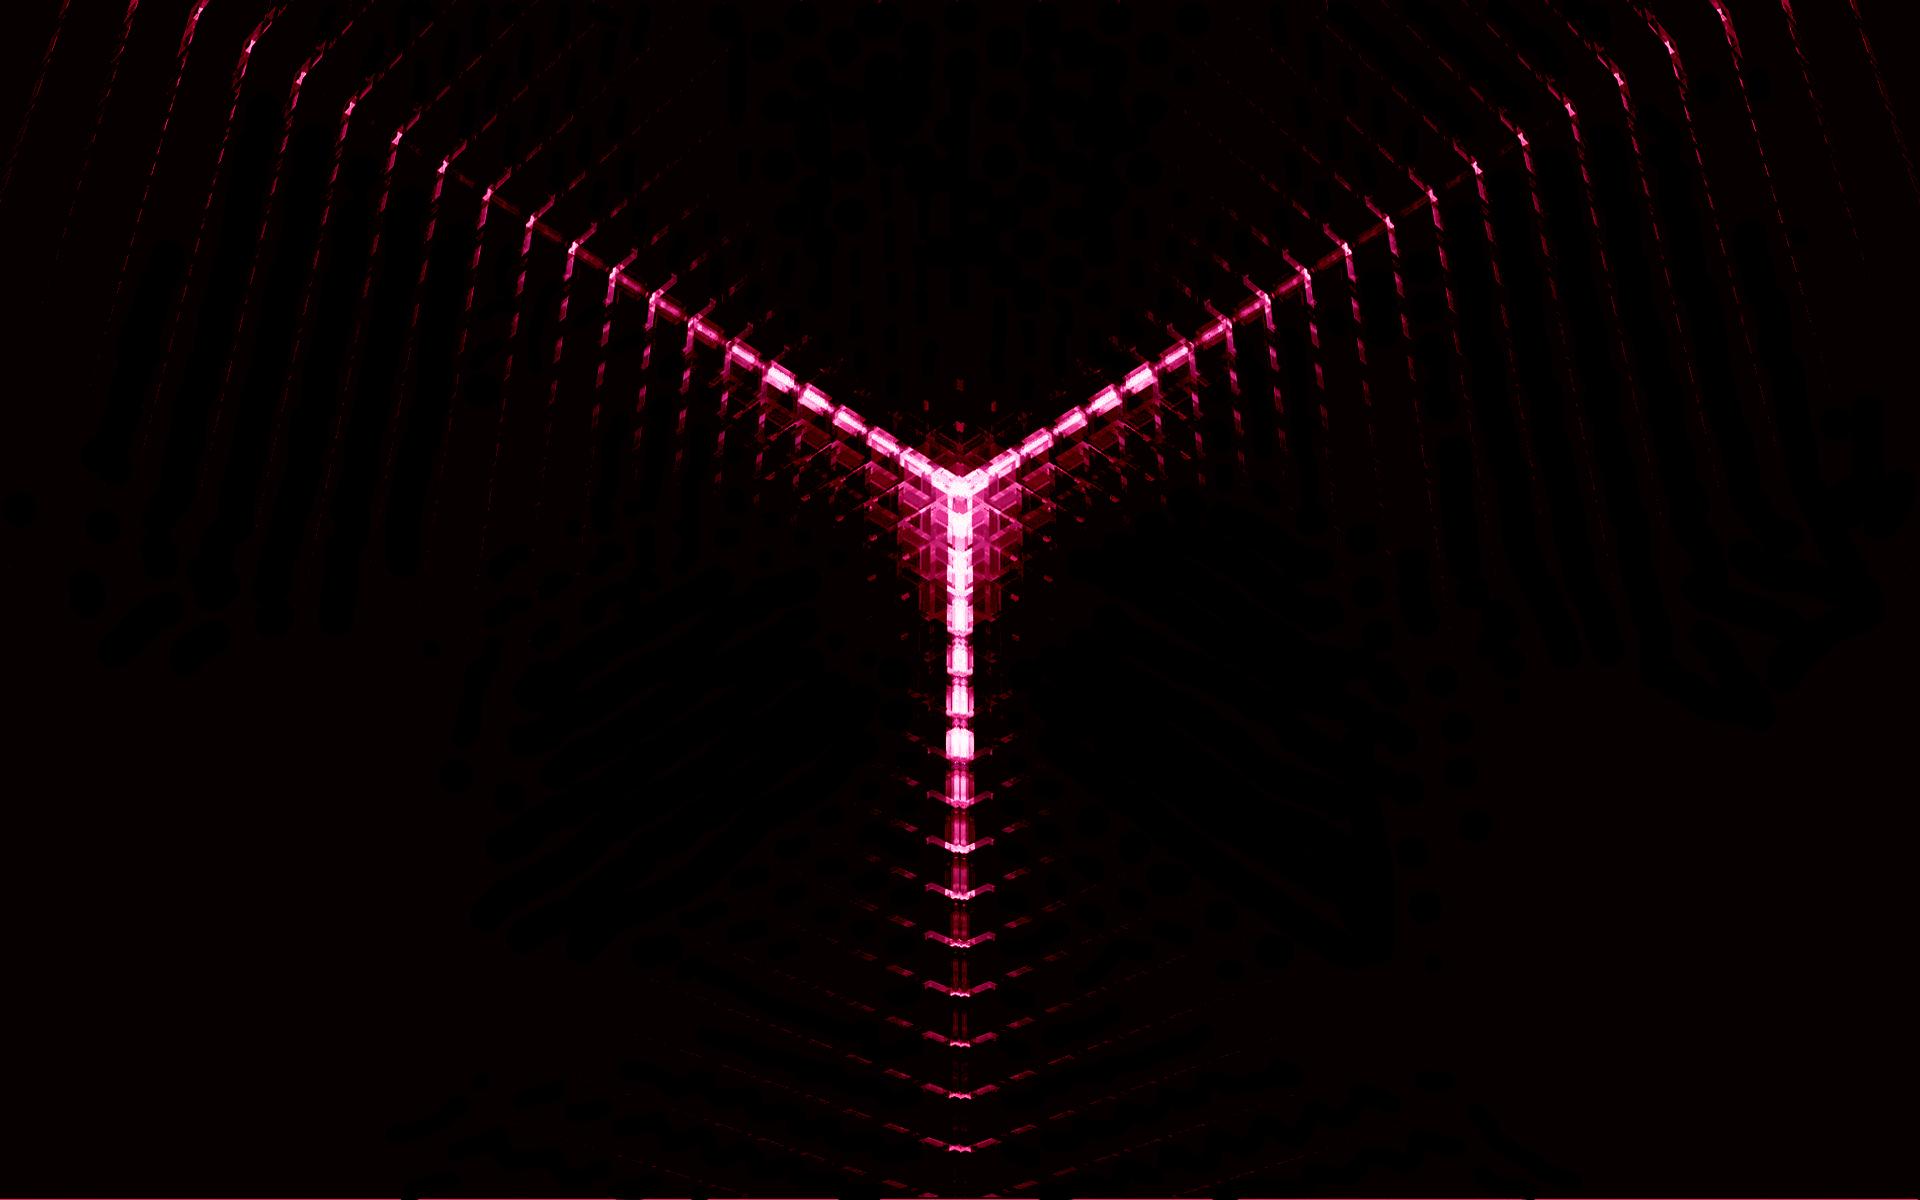 77 Red Neon Wallpaper On Wallpapersafari